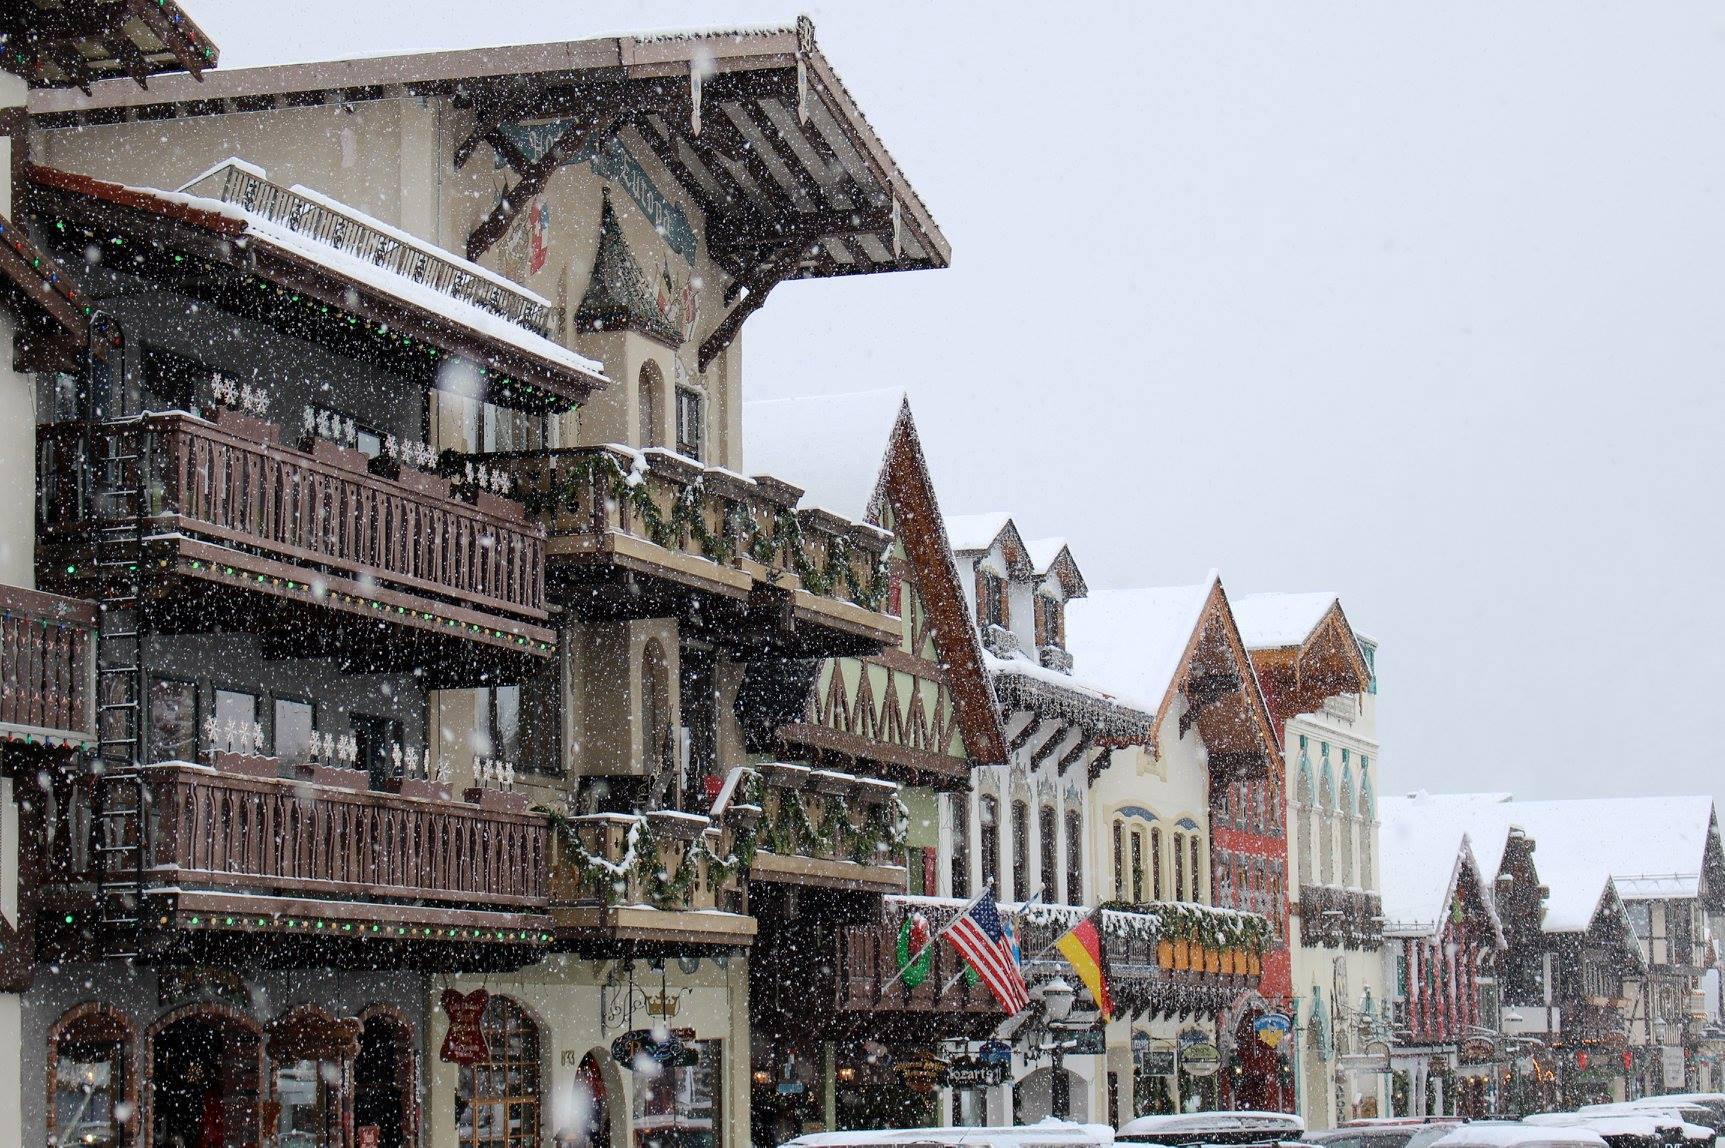 Destination Leavenworth Vacation Rental Management Company Bavarian Village Leavenworth Washington